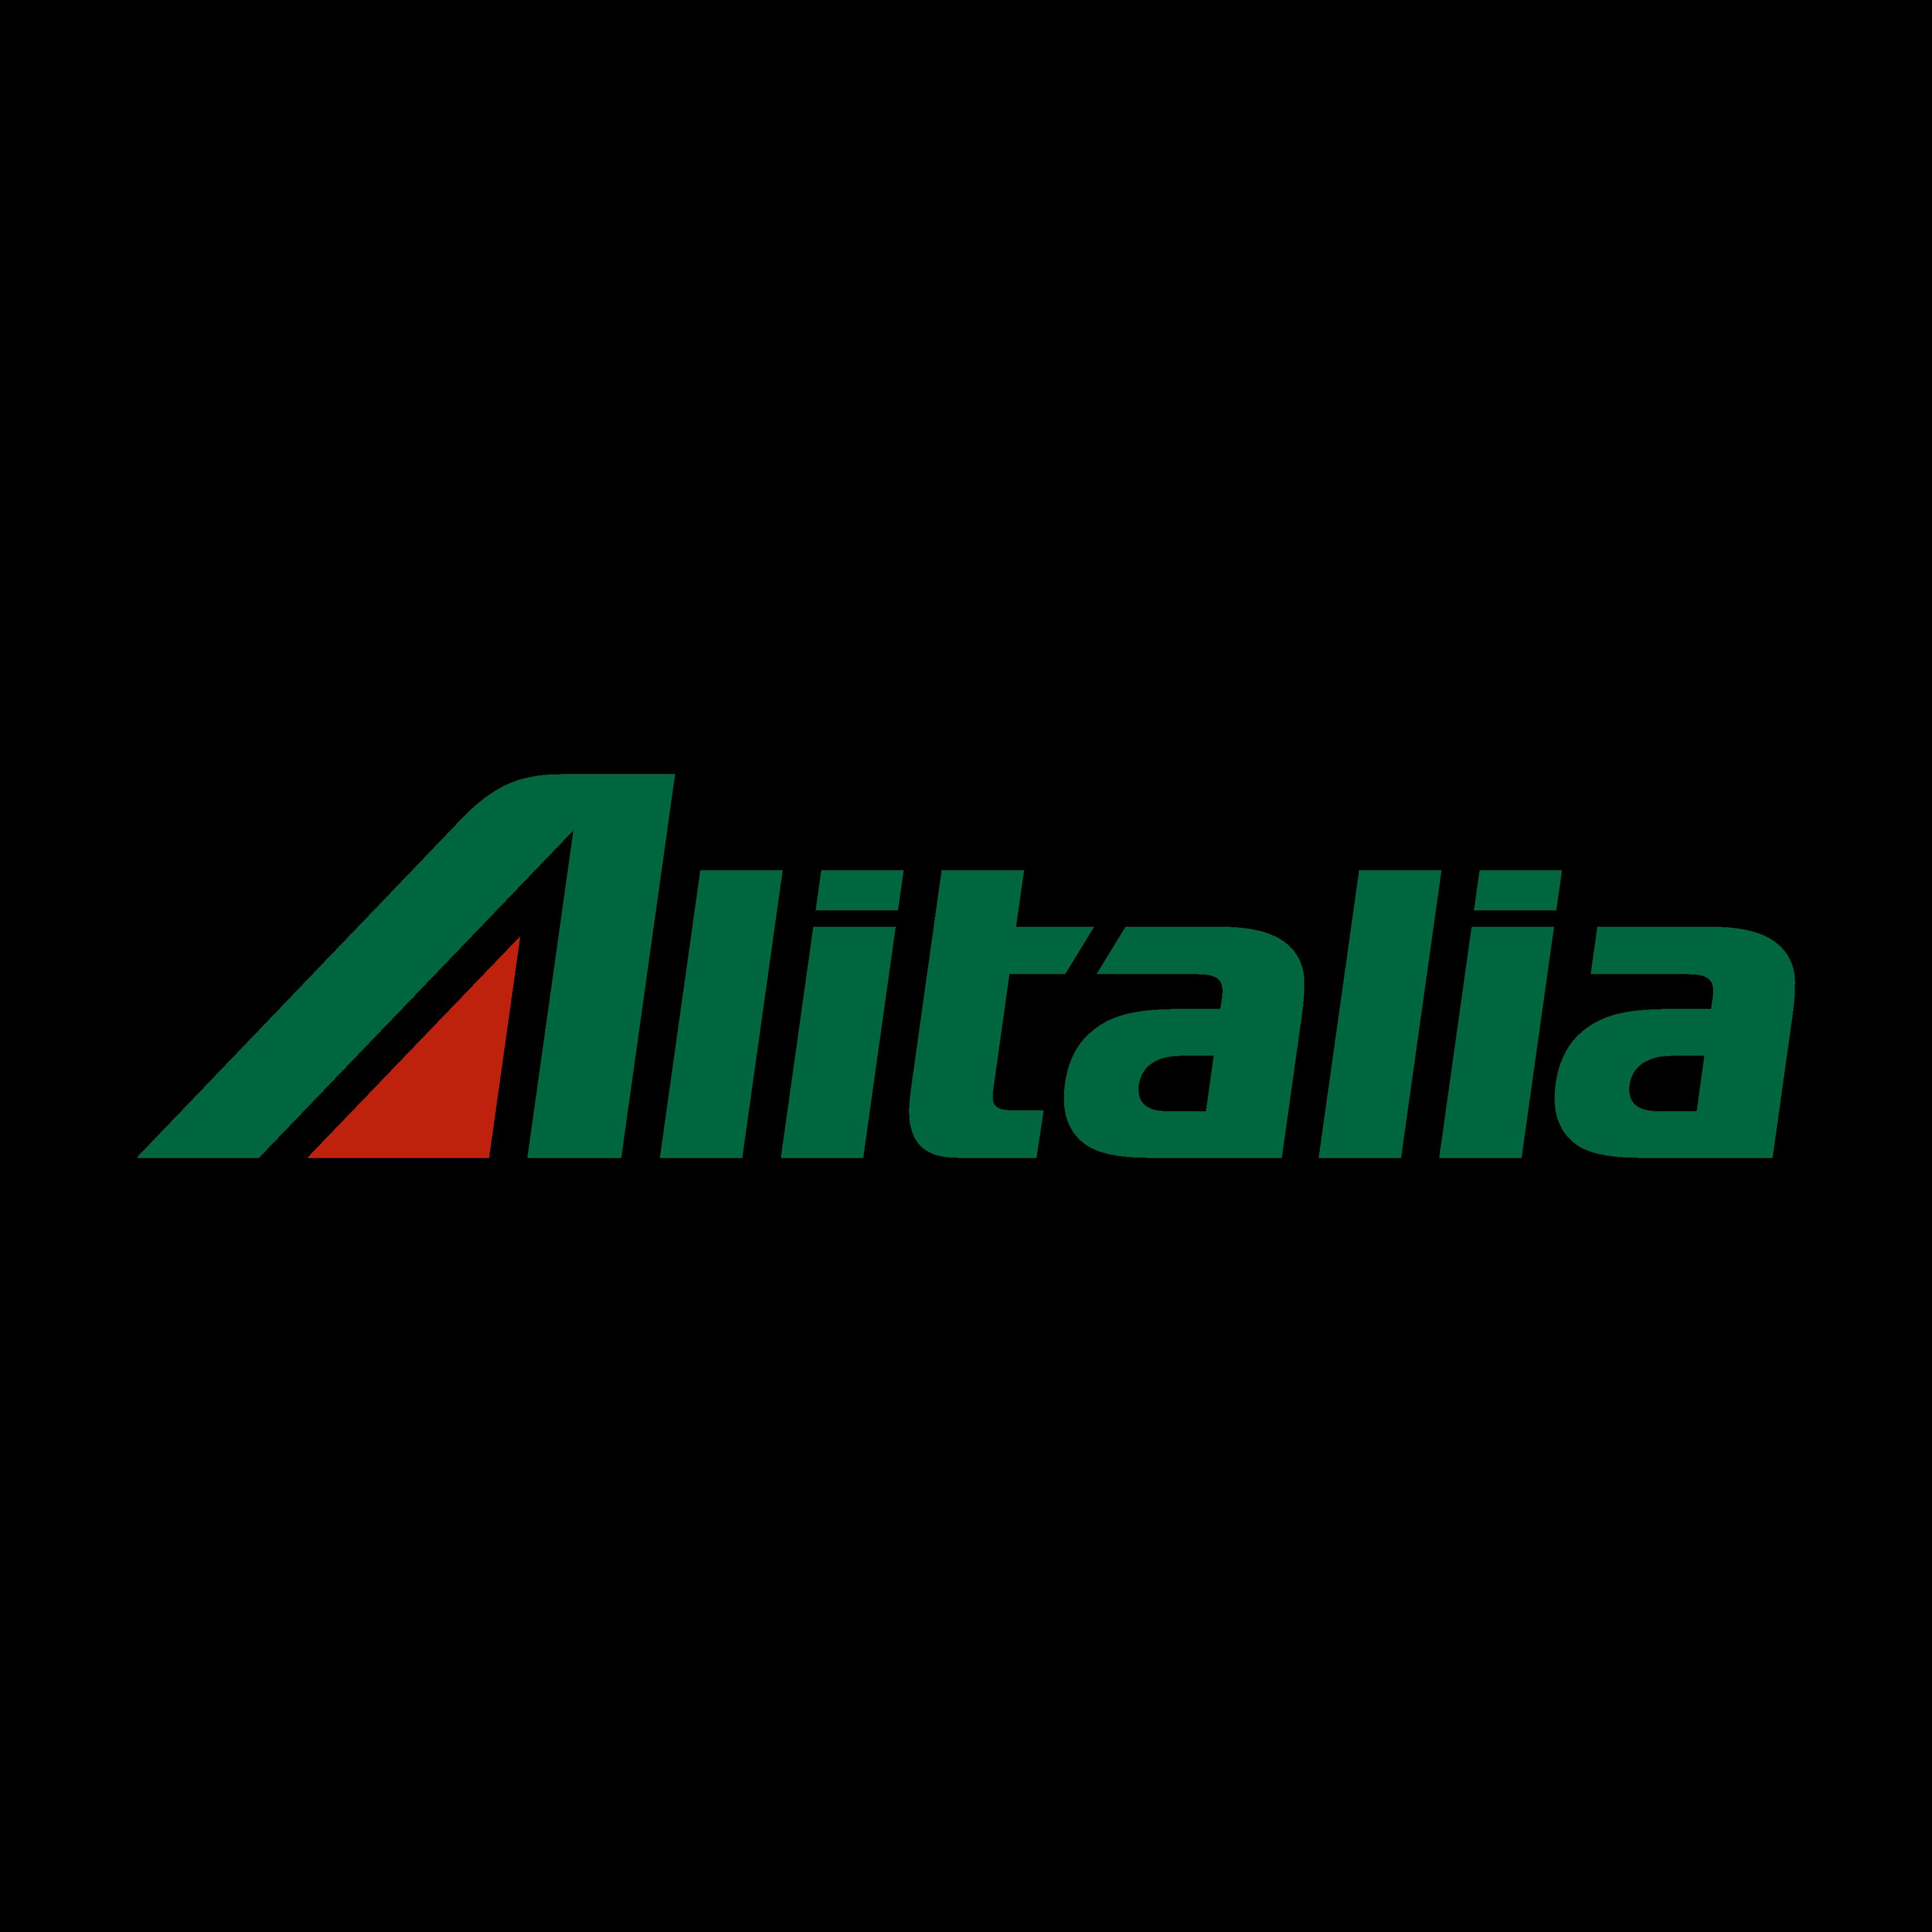 alitalia-logo-0